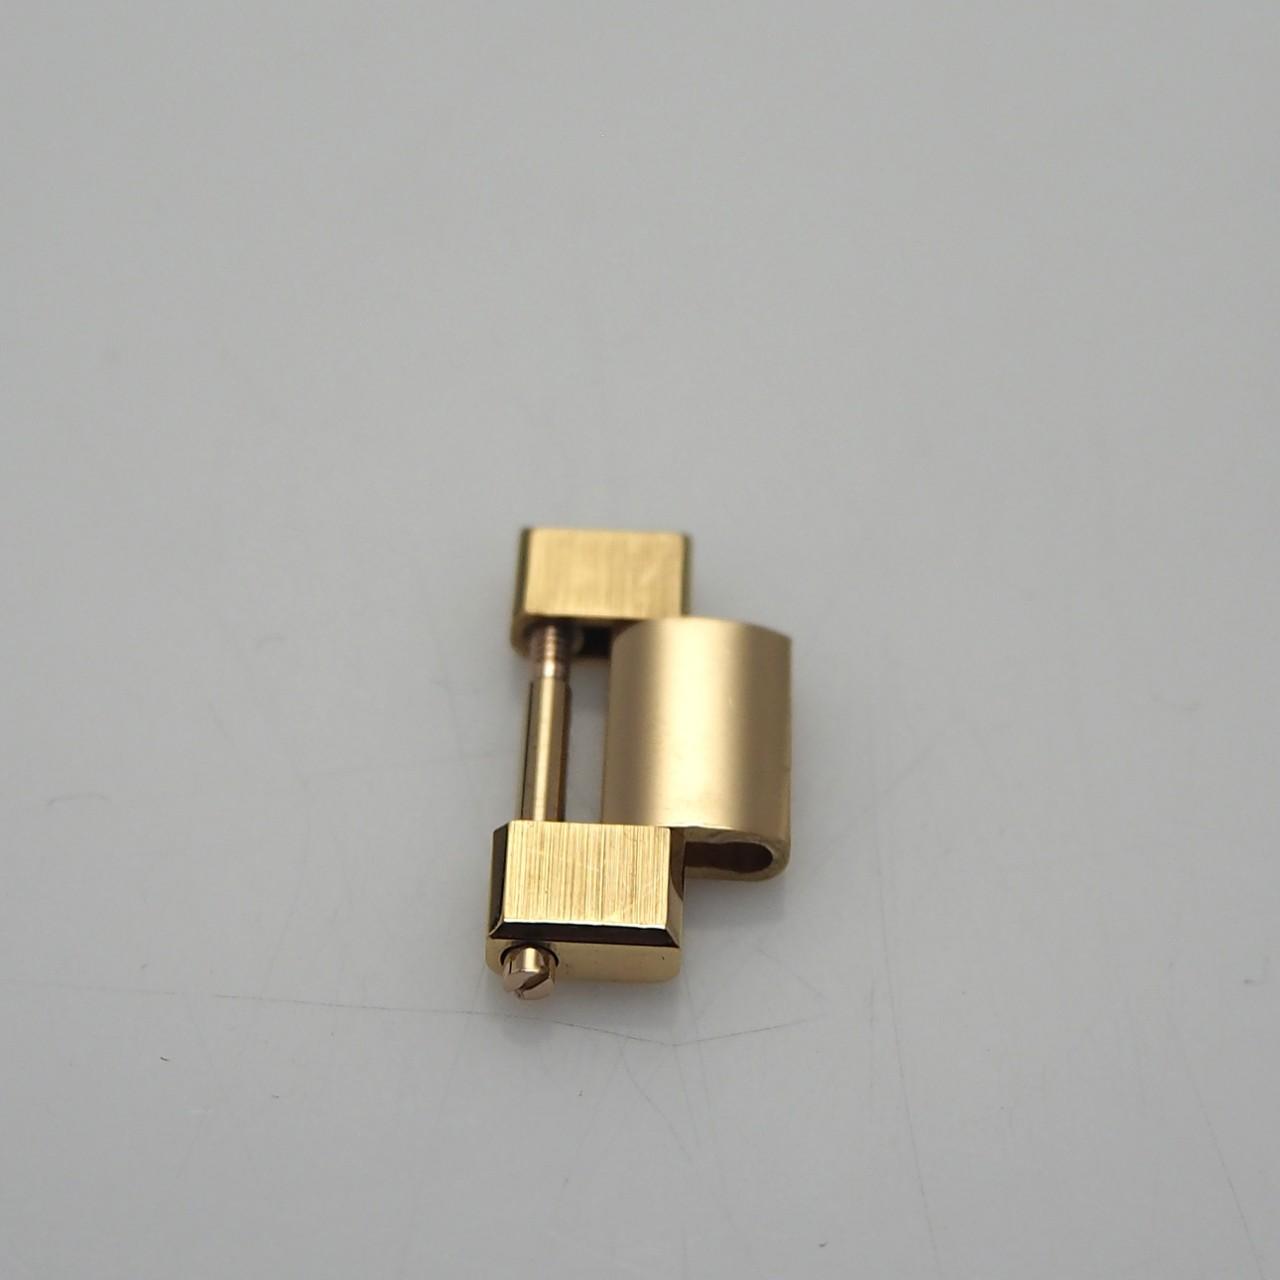 Rolex Oysterquartz Glied/ Bandelement -Gold 18k/750, 16mm